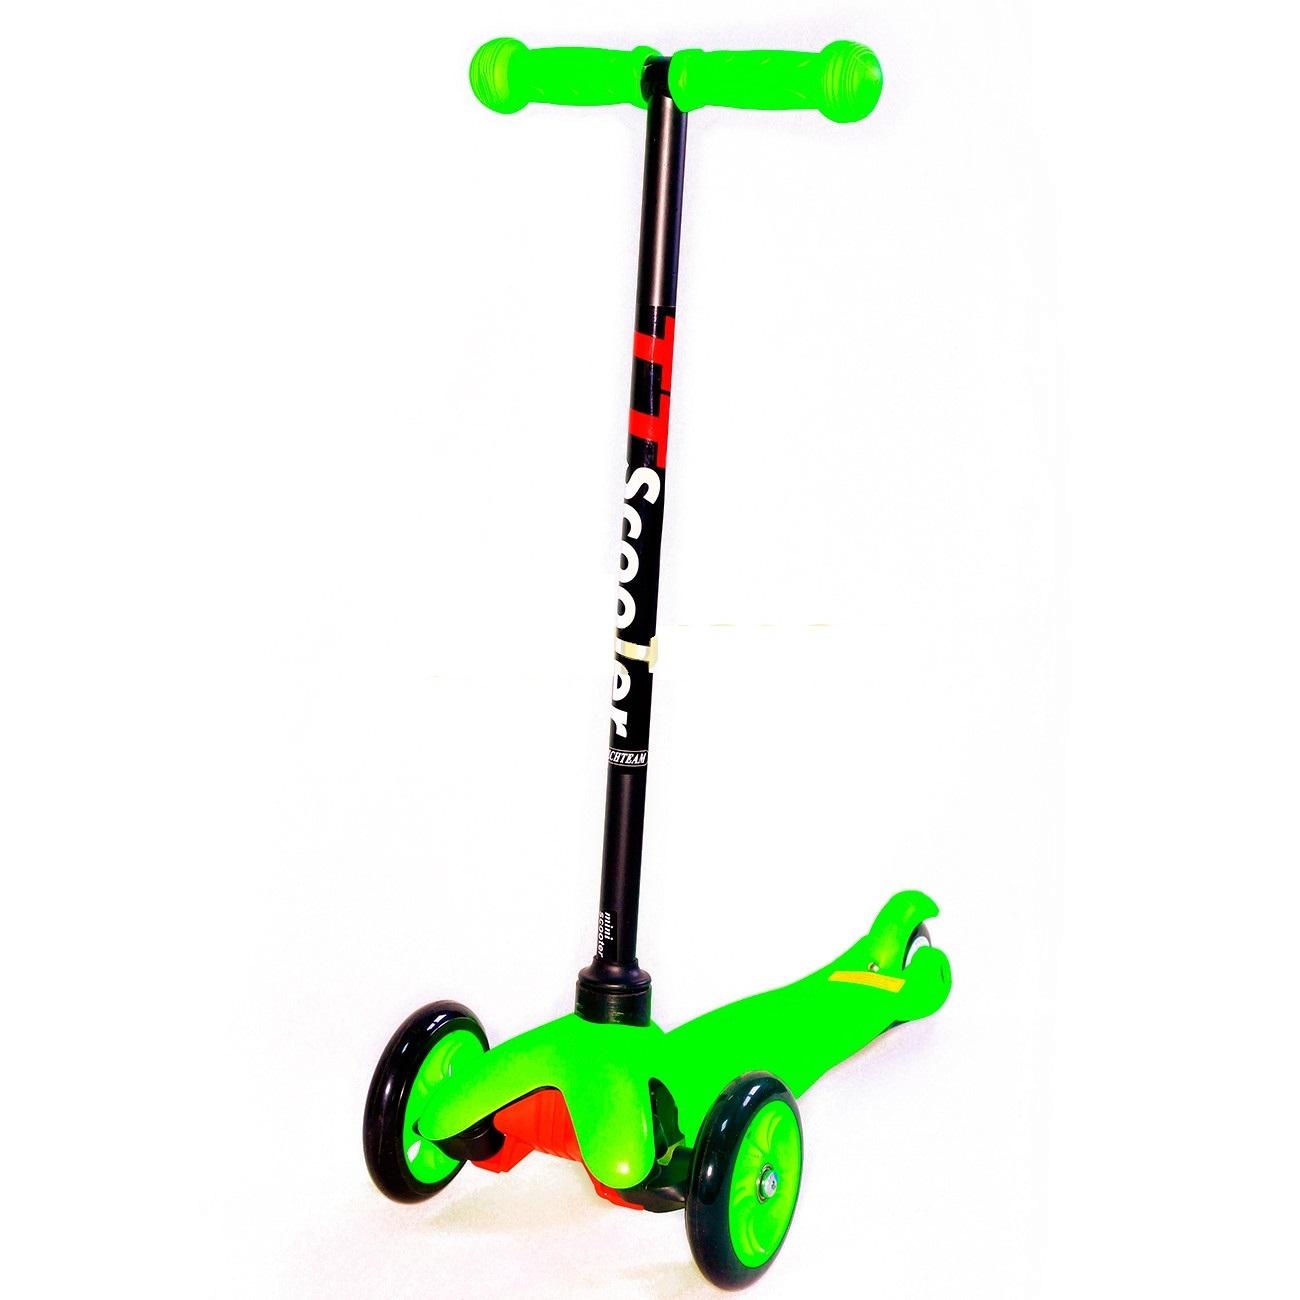 Распродажа Самокат детский ТТ Scooter Mini 4c4a786223acd8b5778d3dbce7c62002.jpg